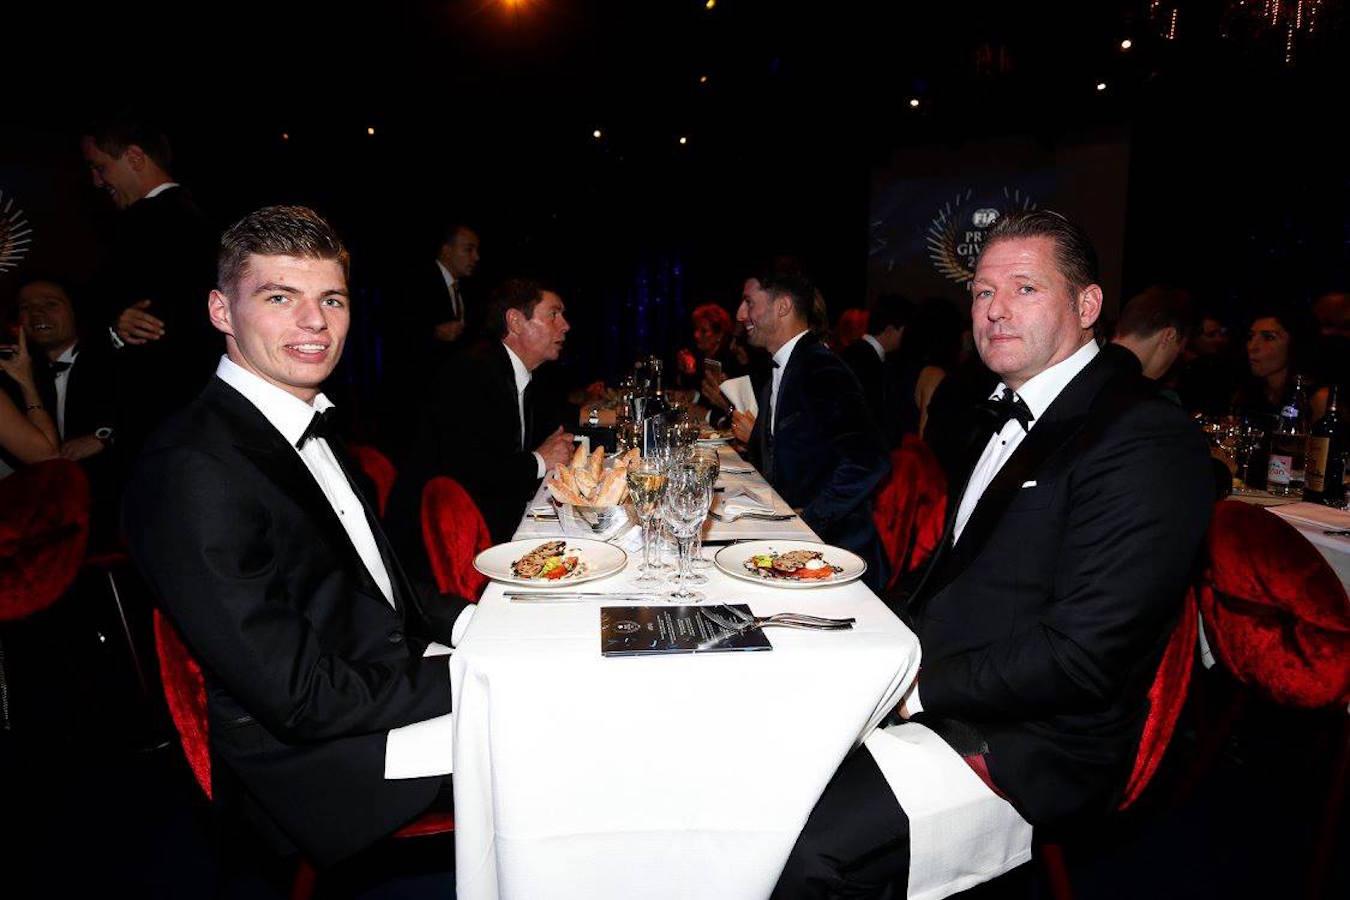 Max and Jos Verstappen at FIA Gala 2015.jpg